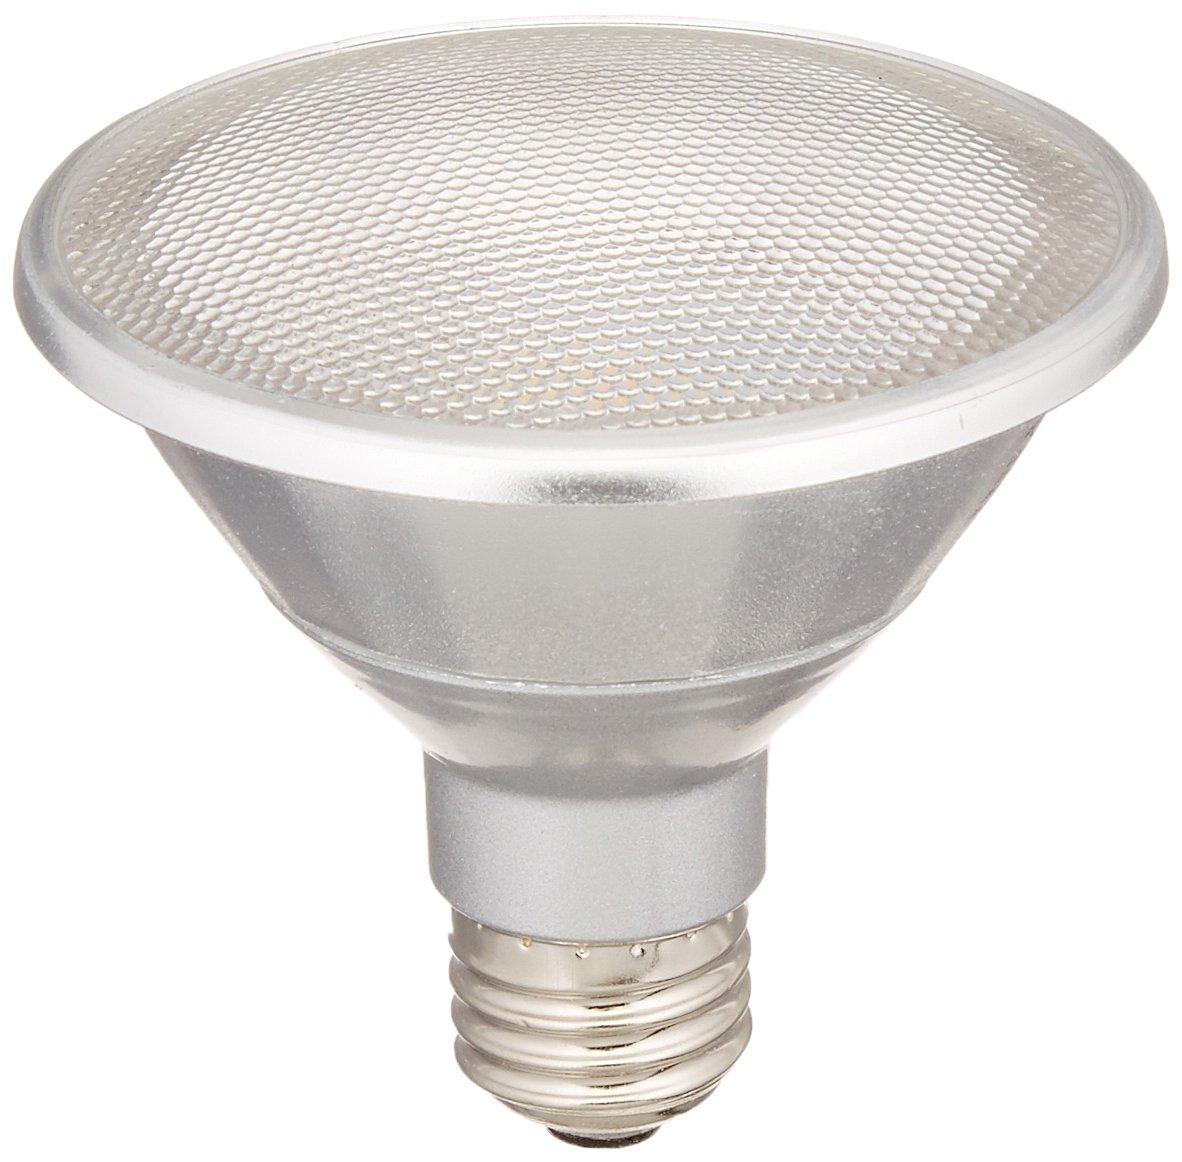 Flood 13W Dimmable Wet Rated Outdoor//Indoor LED PAR30 Short Neck Reflector Bulb Medium Bulbrite LED13PAR30S//FL40//830//WD 50W Halogen Equivalent Soft White E26 Base